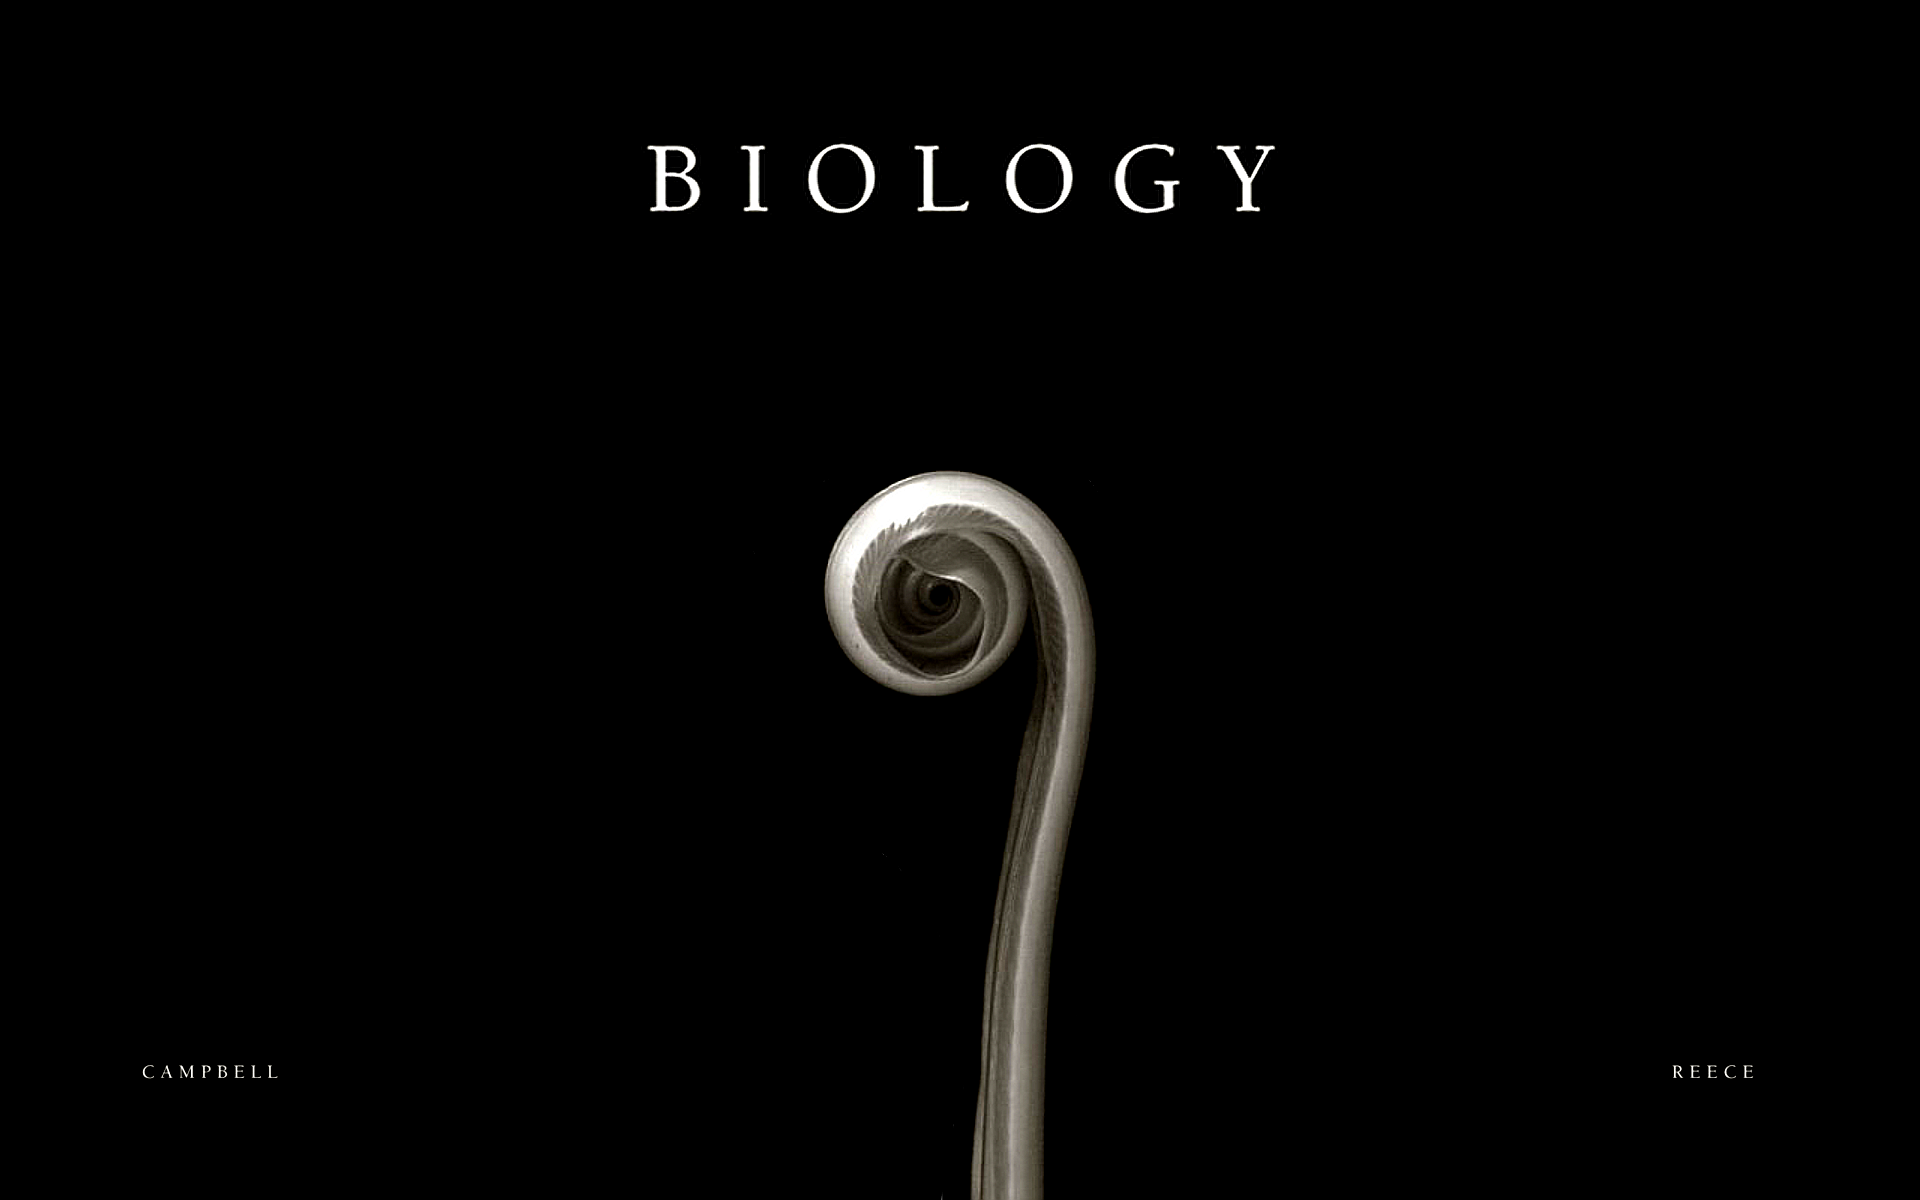 Biology Wallpaper 1920x1200 Biology 1920x1200